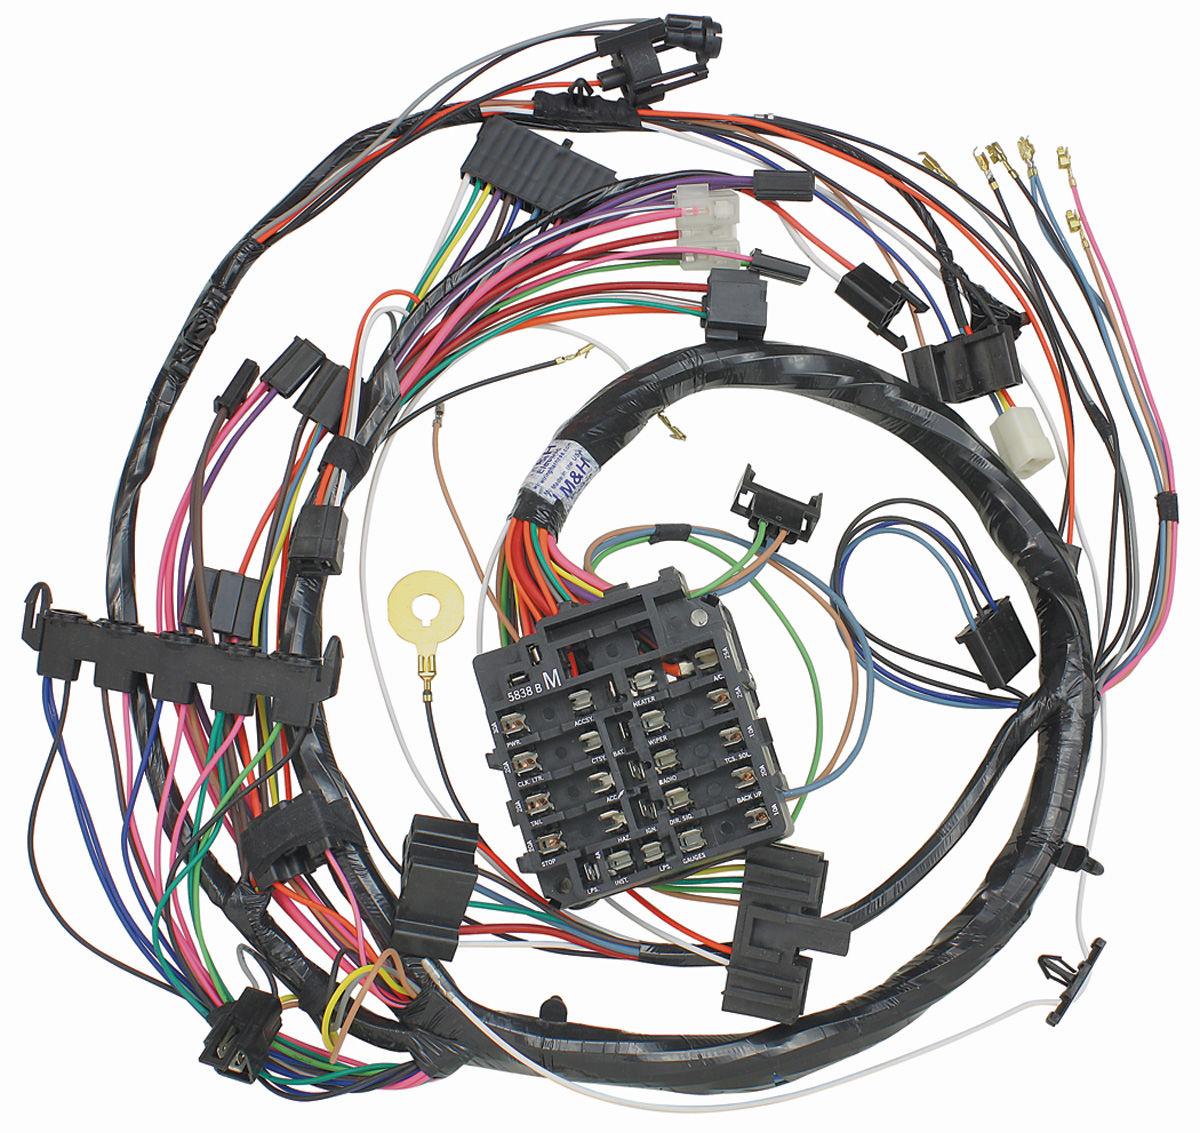 m h monte carlo dash instrument panel harness sweep gauge type fits 1972 monte carlo. Black Bedroom Furniture Sets. Home Design Ideas